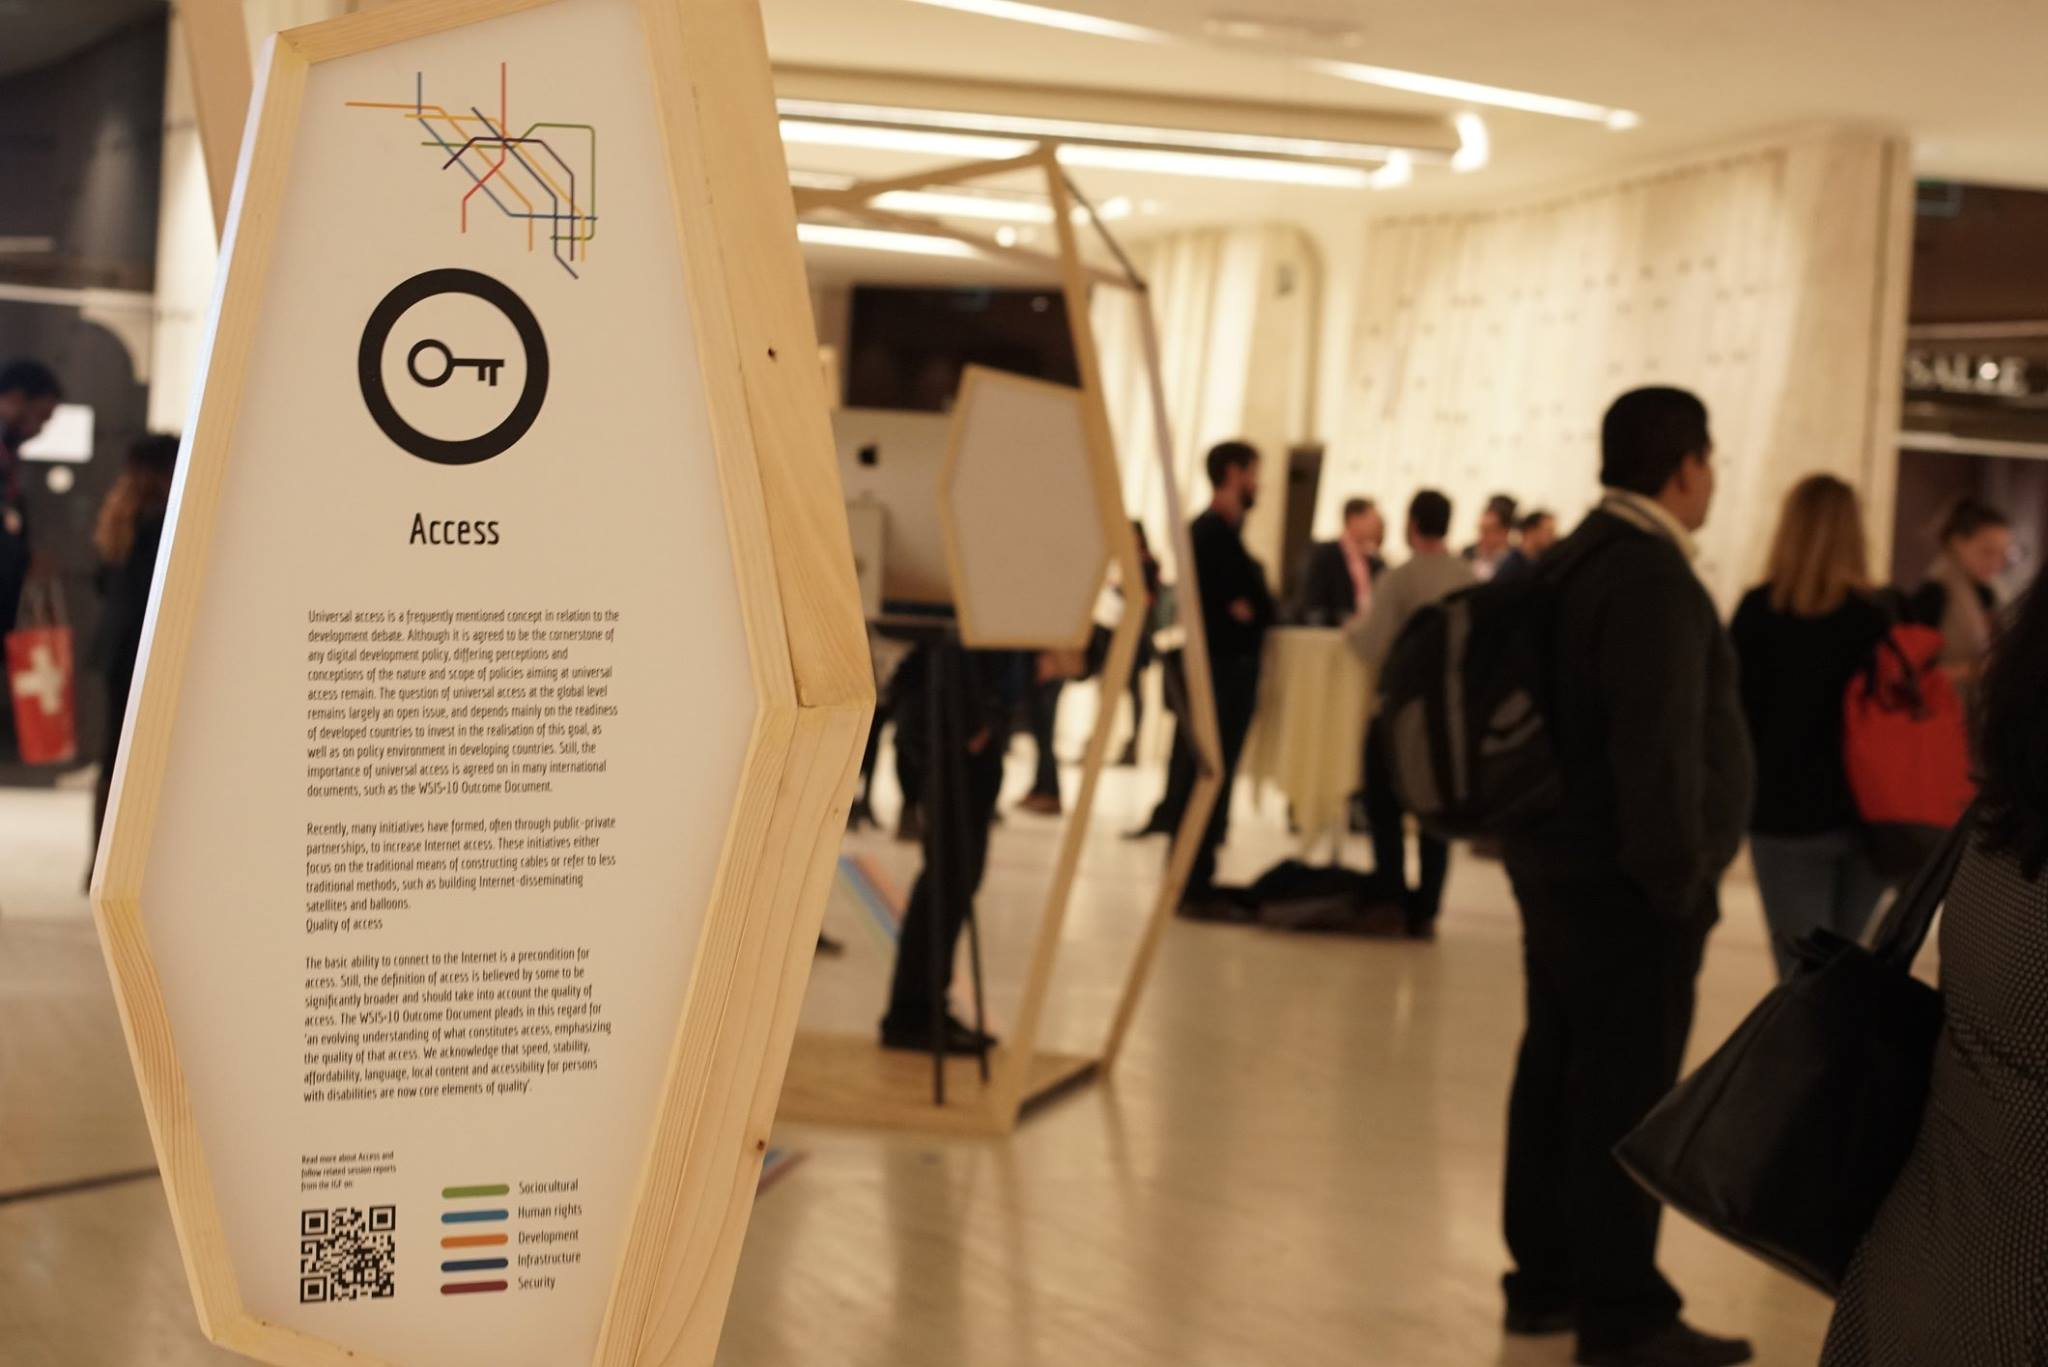 ART@IGF exhibition IGF2017 United Nations Geneva hallway building E